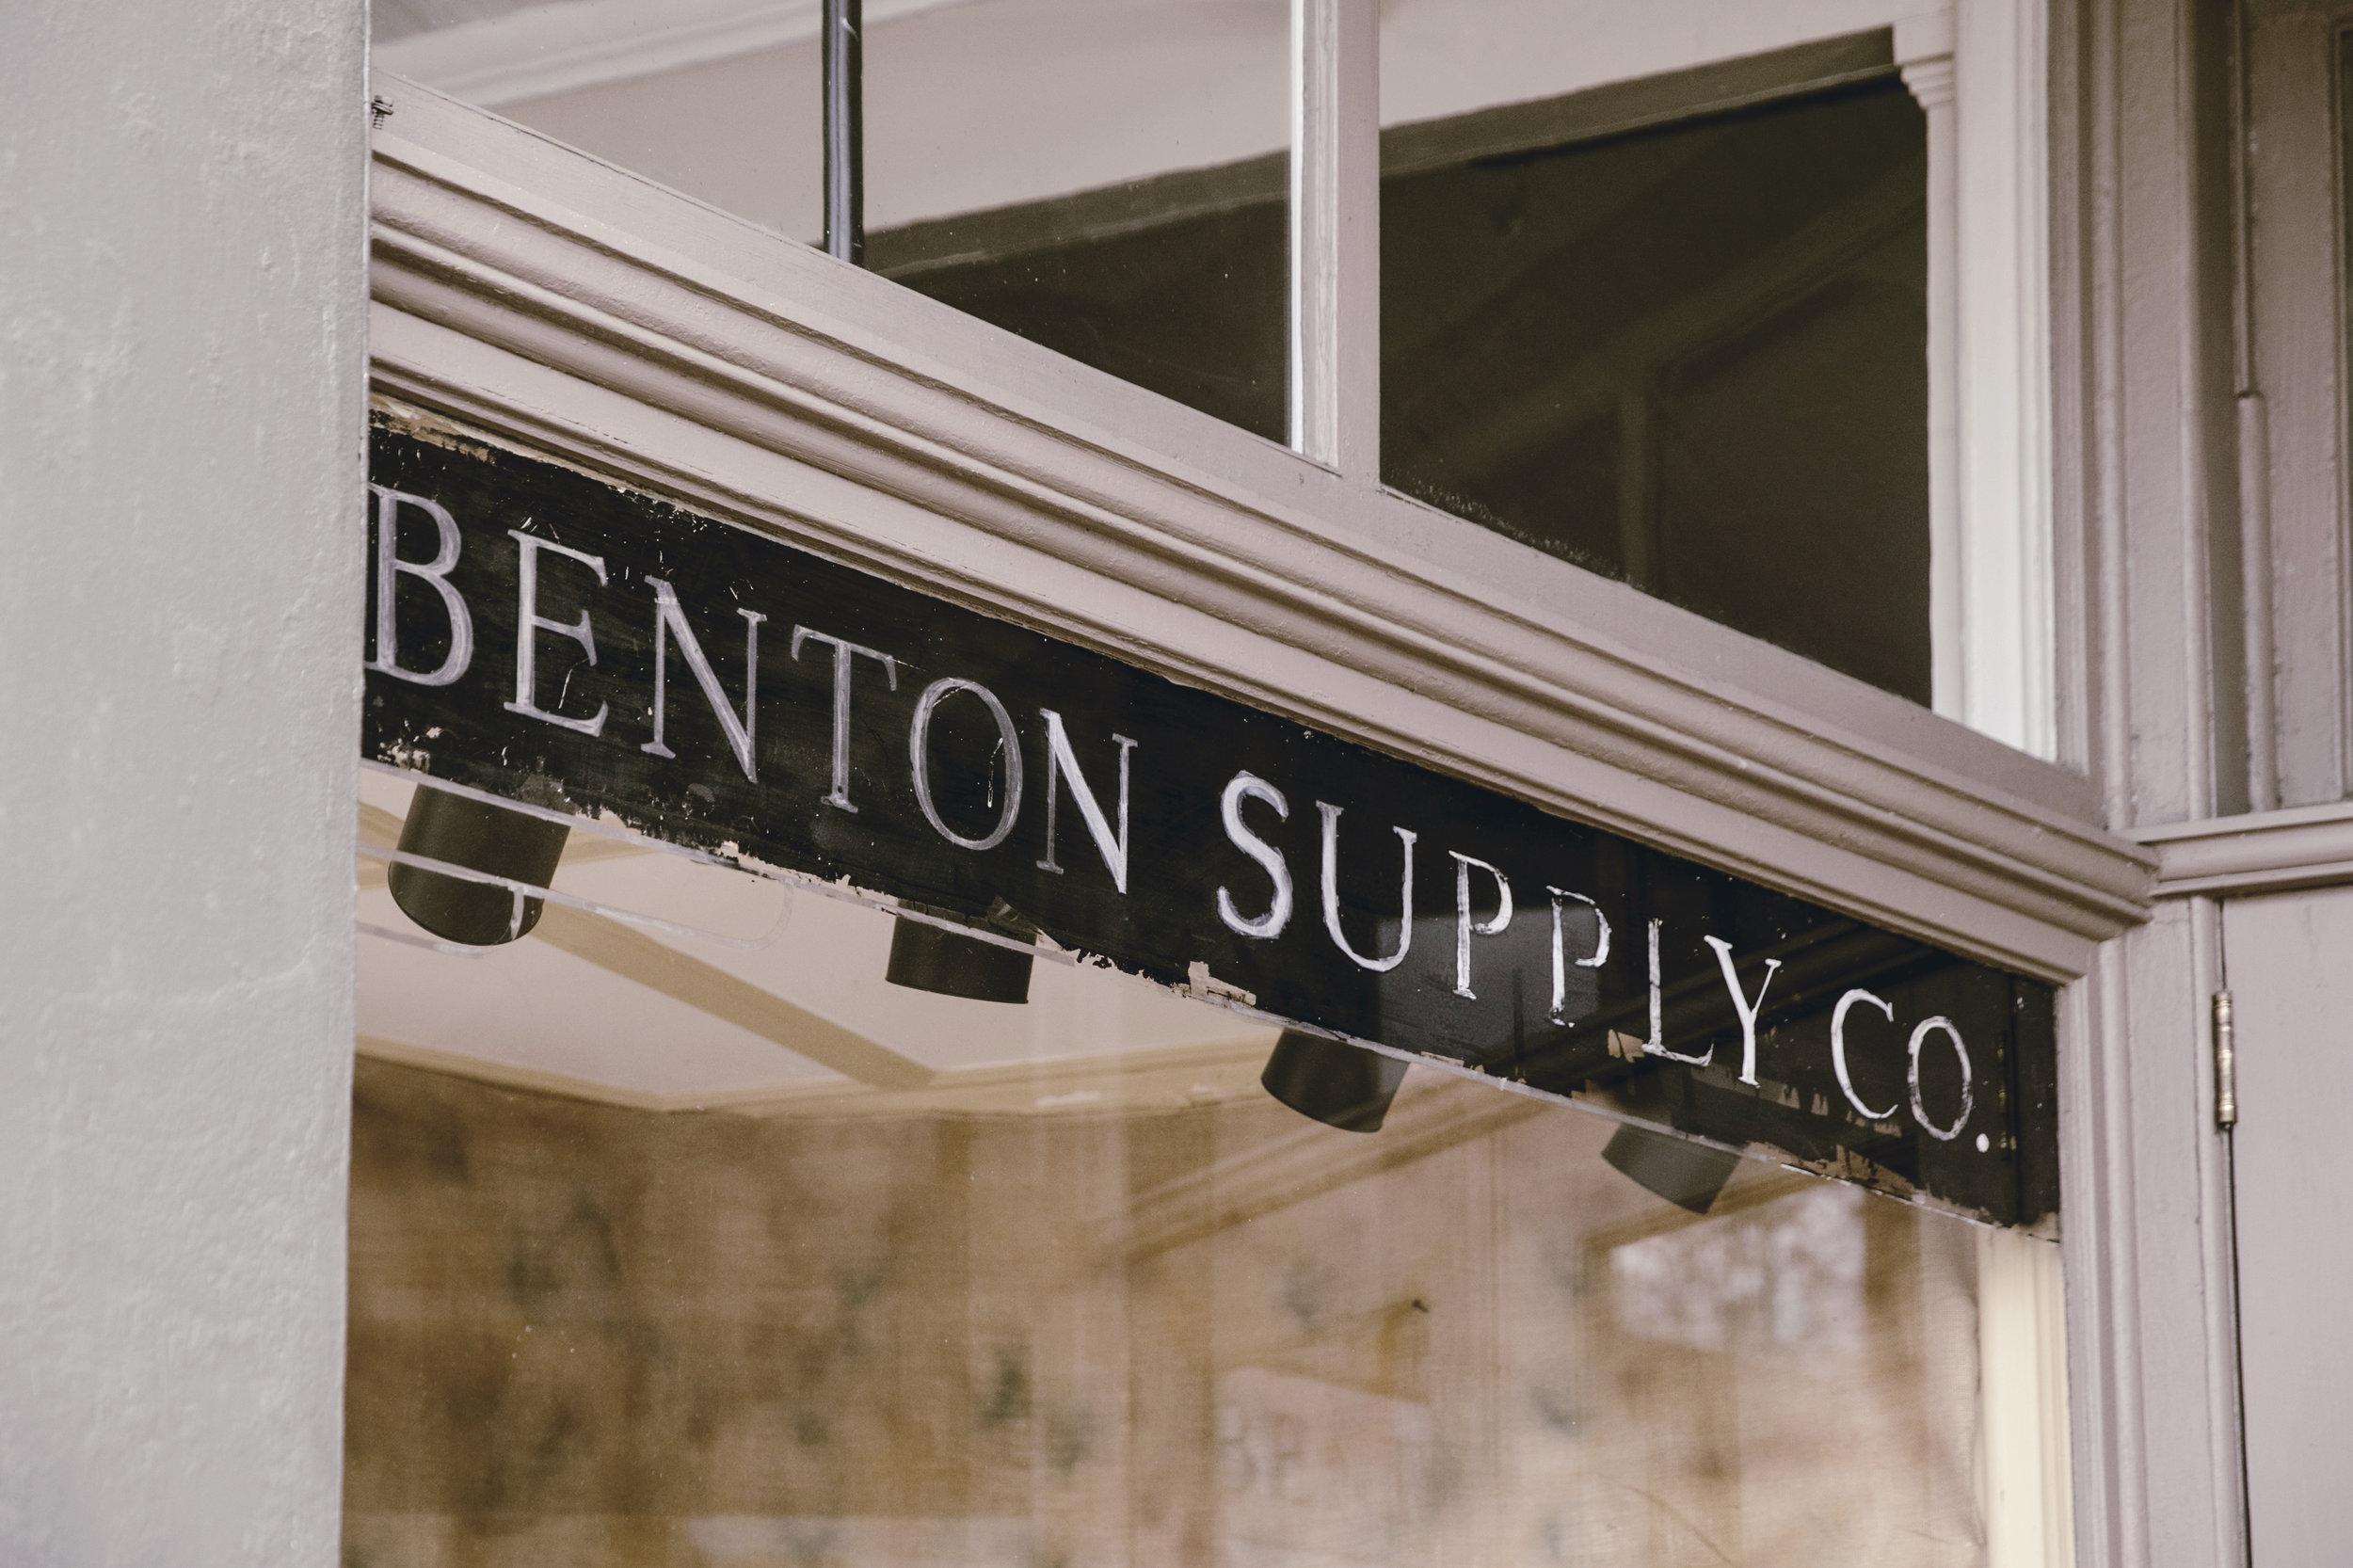 Historic Benton Supply Co building in Monticello GA  / heirloomed